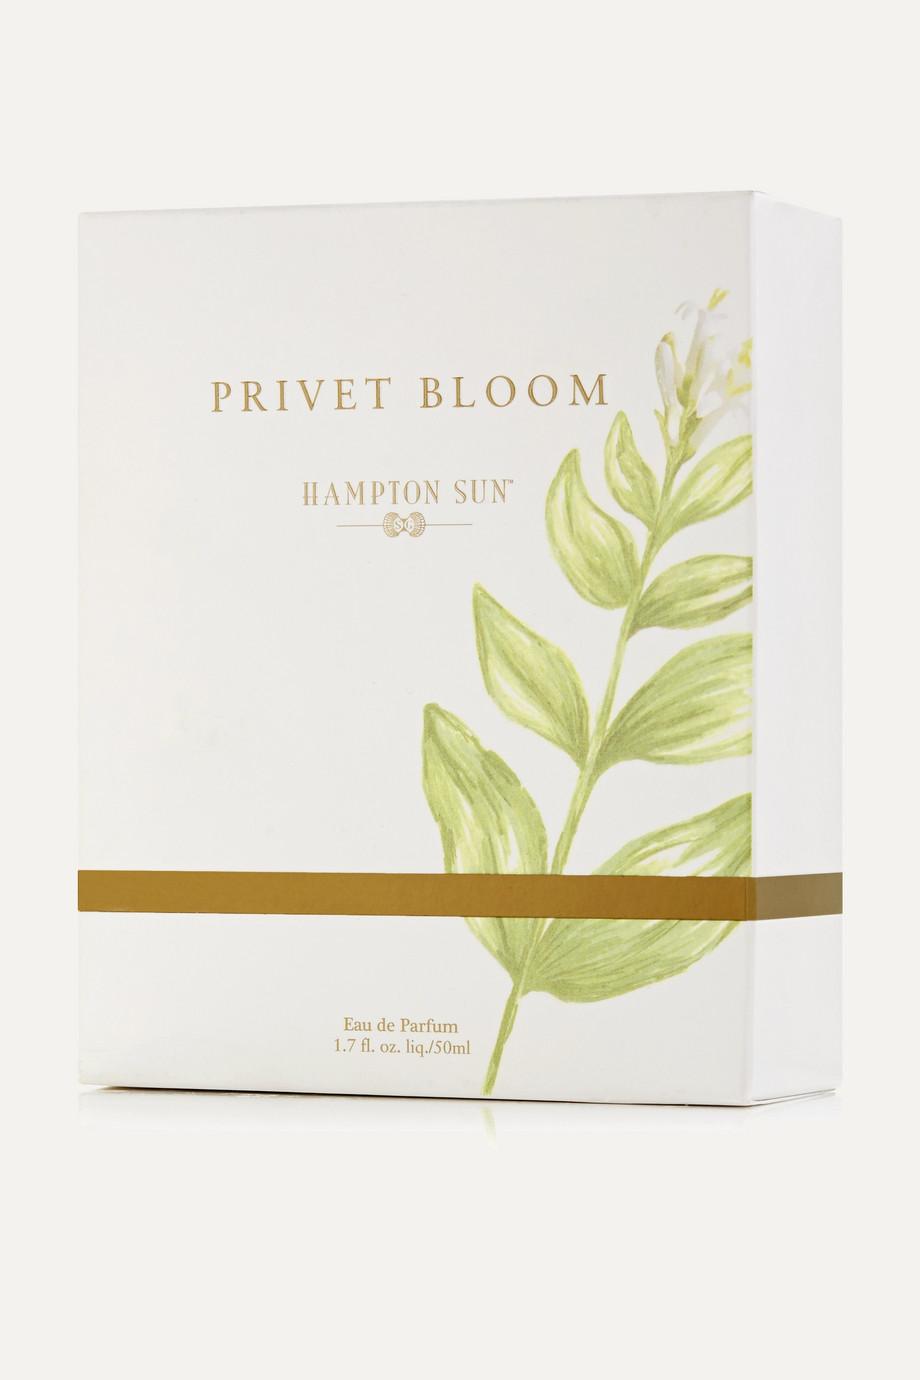 Hampton Sun Privet Bloom Eau de Parfum, 50ml